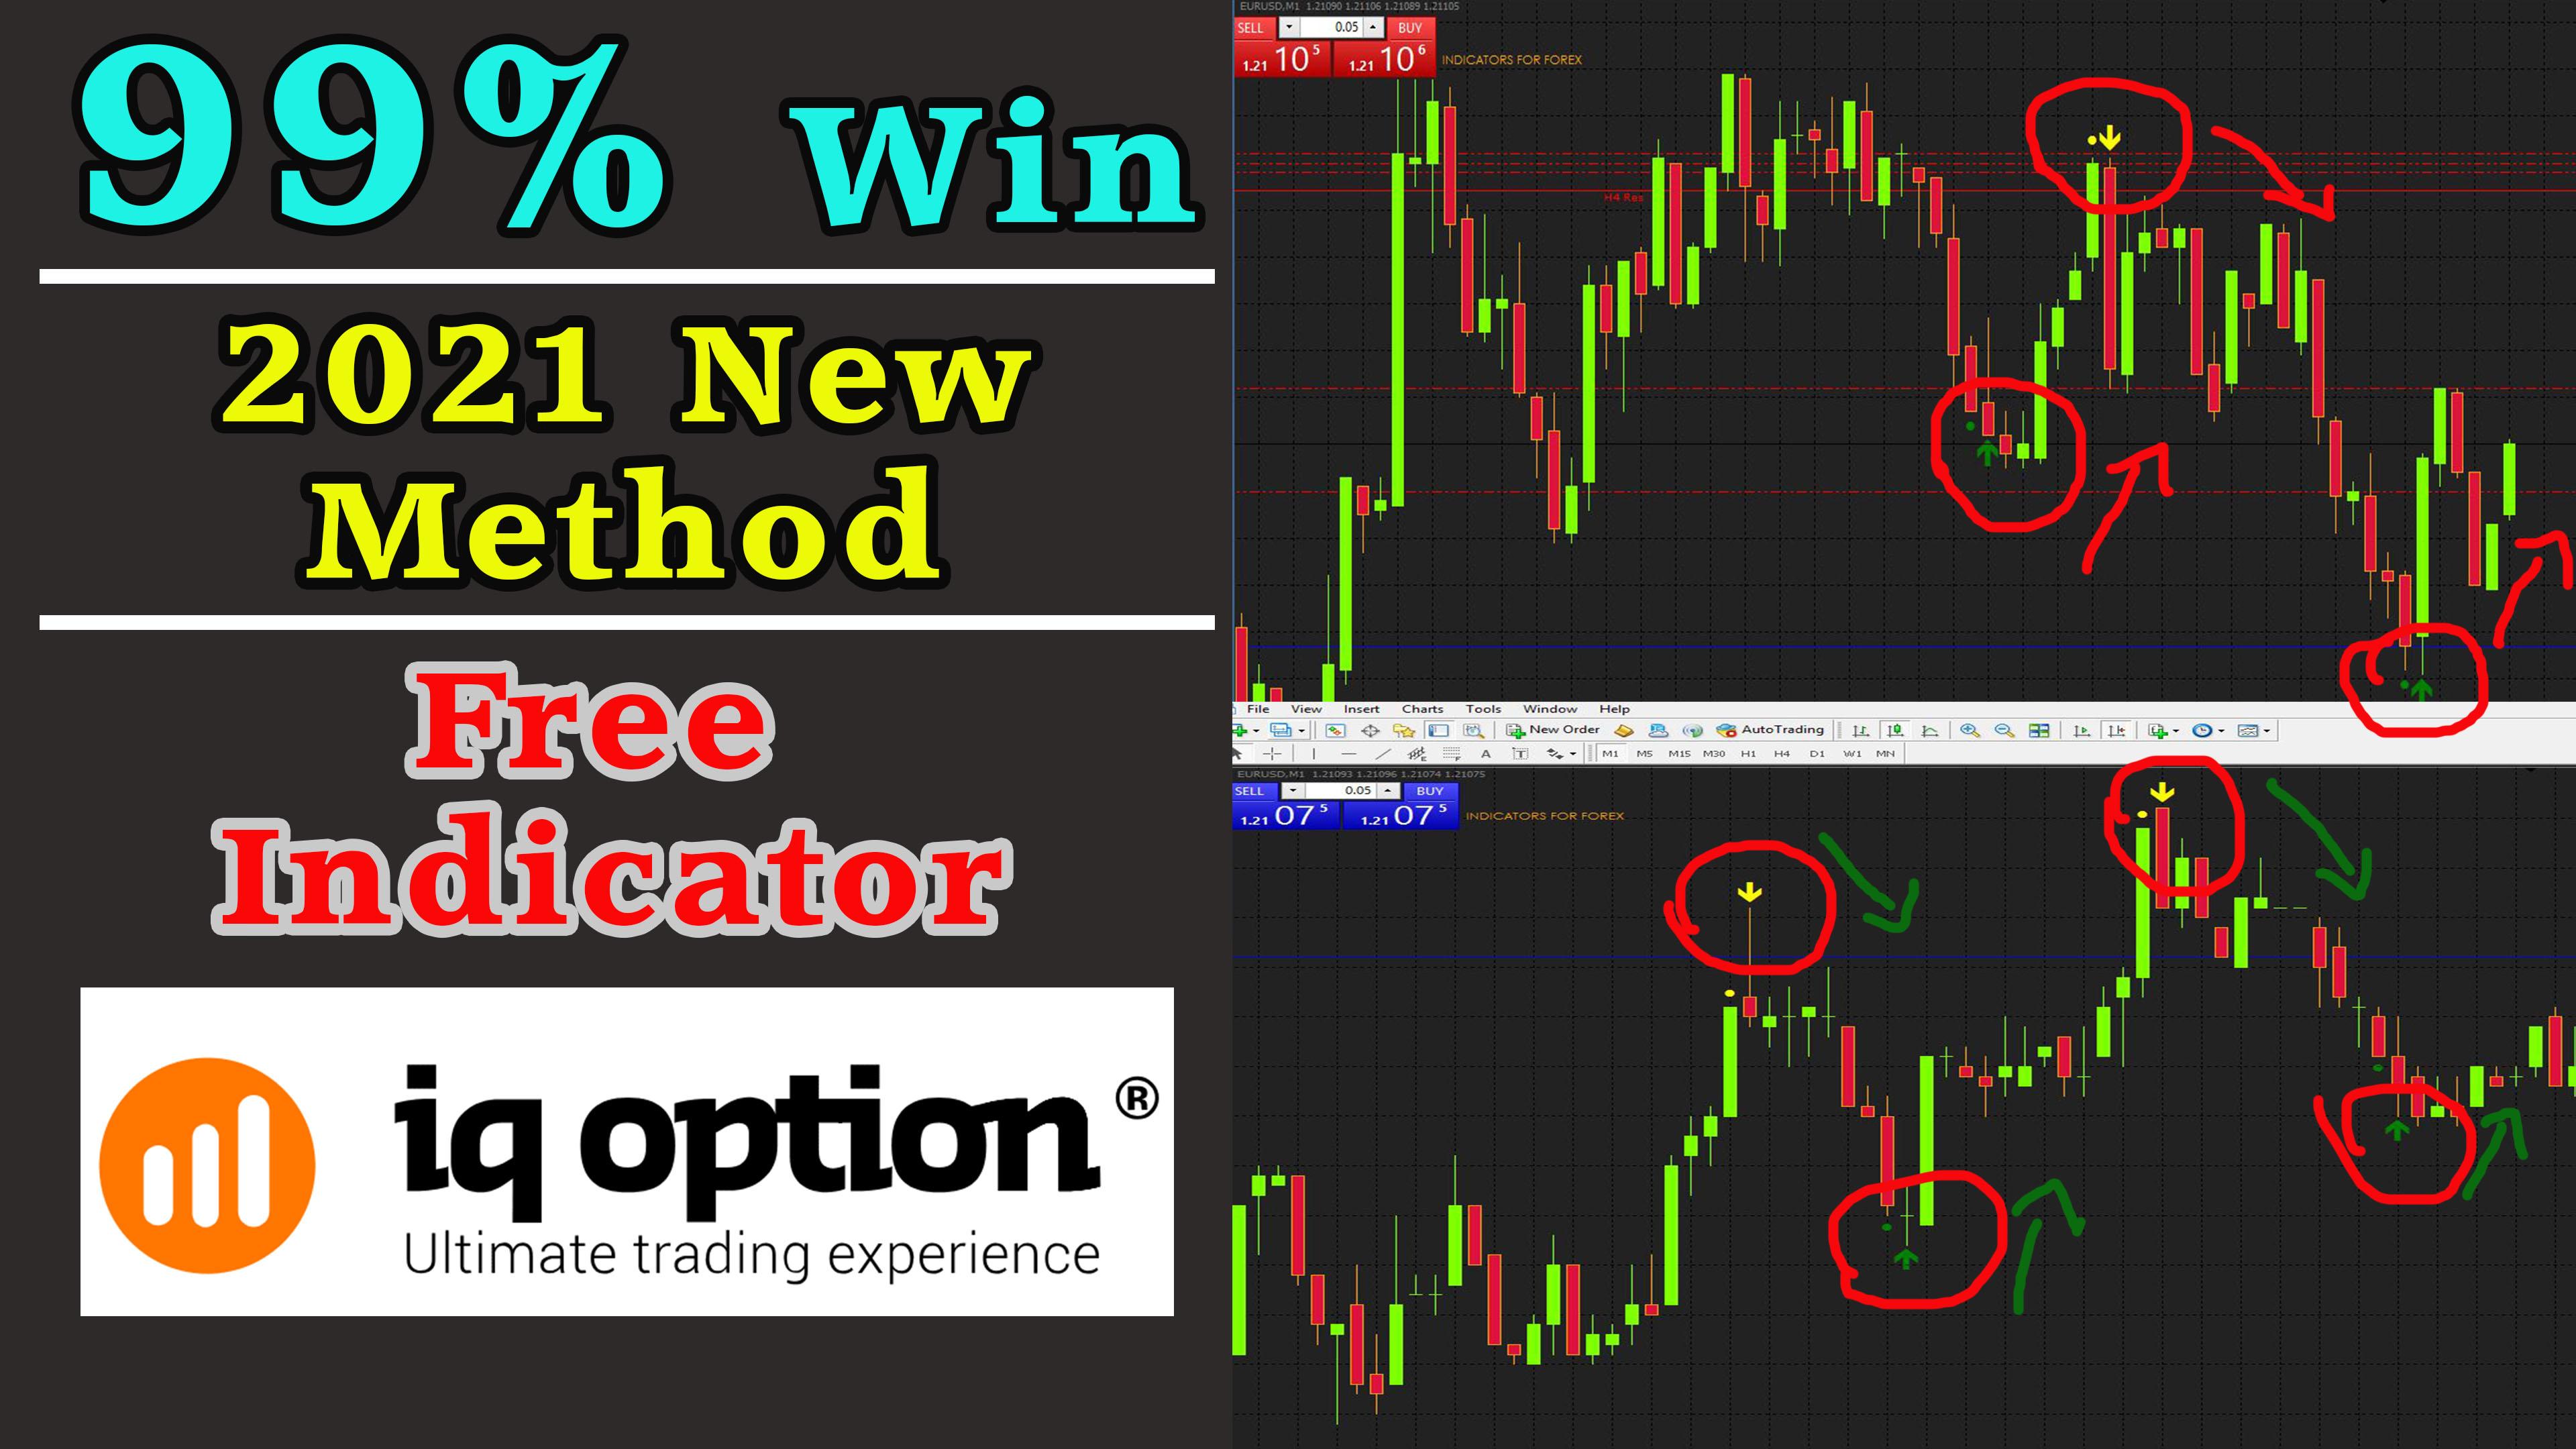 ITM Total FX2021 5 minute Binary Option Indicator 99% Wining Chance ( Arrow No reprint )